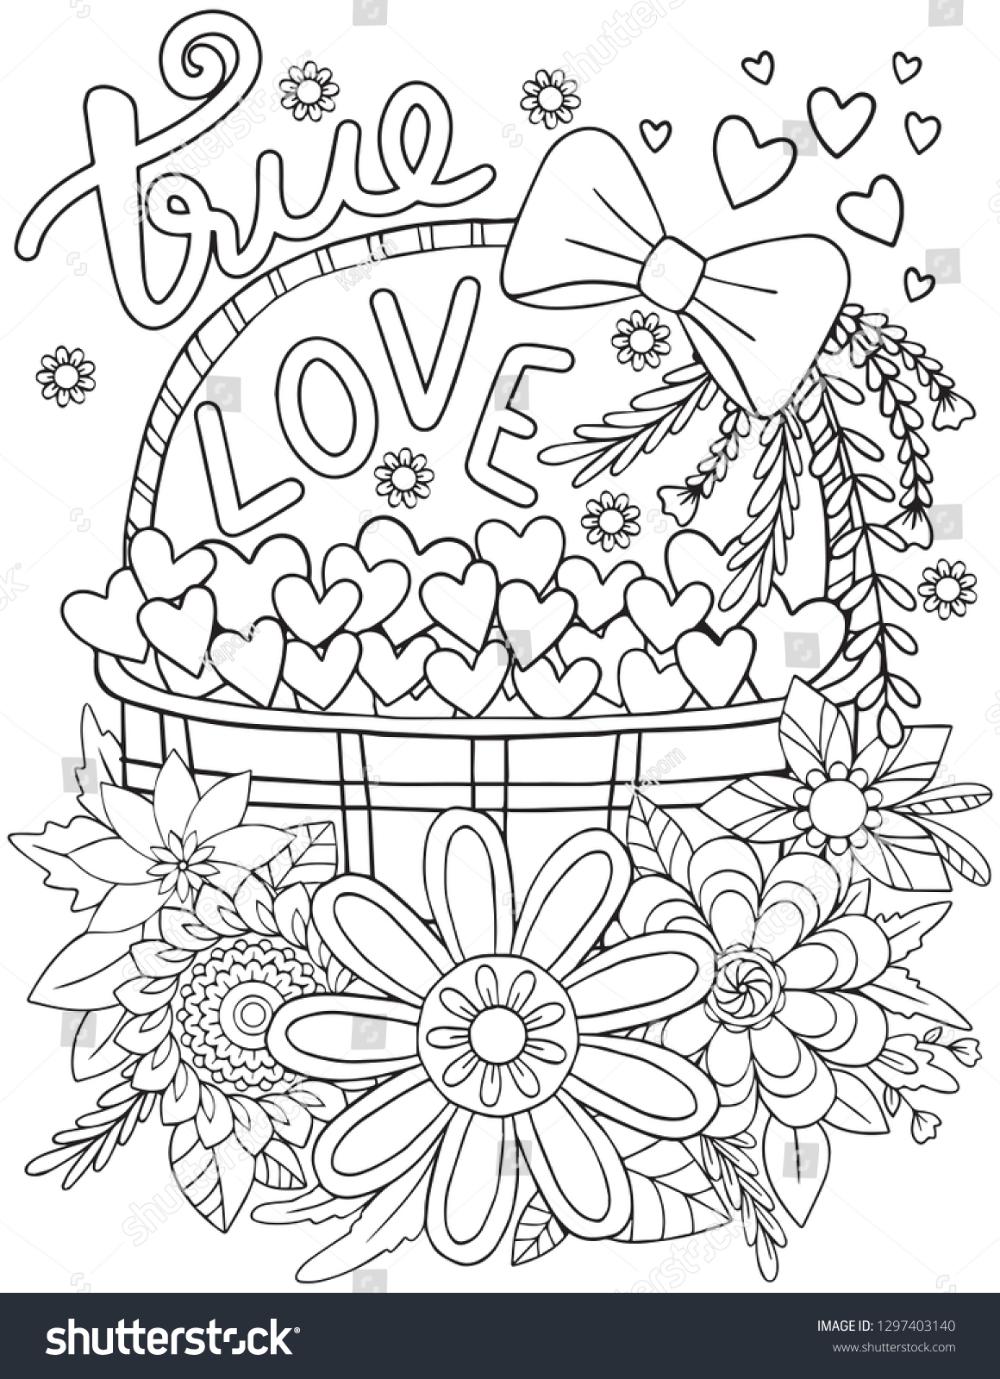 Hand Drawn Inspiration Word Doodles Art Stock Vector ...